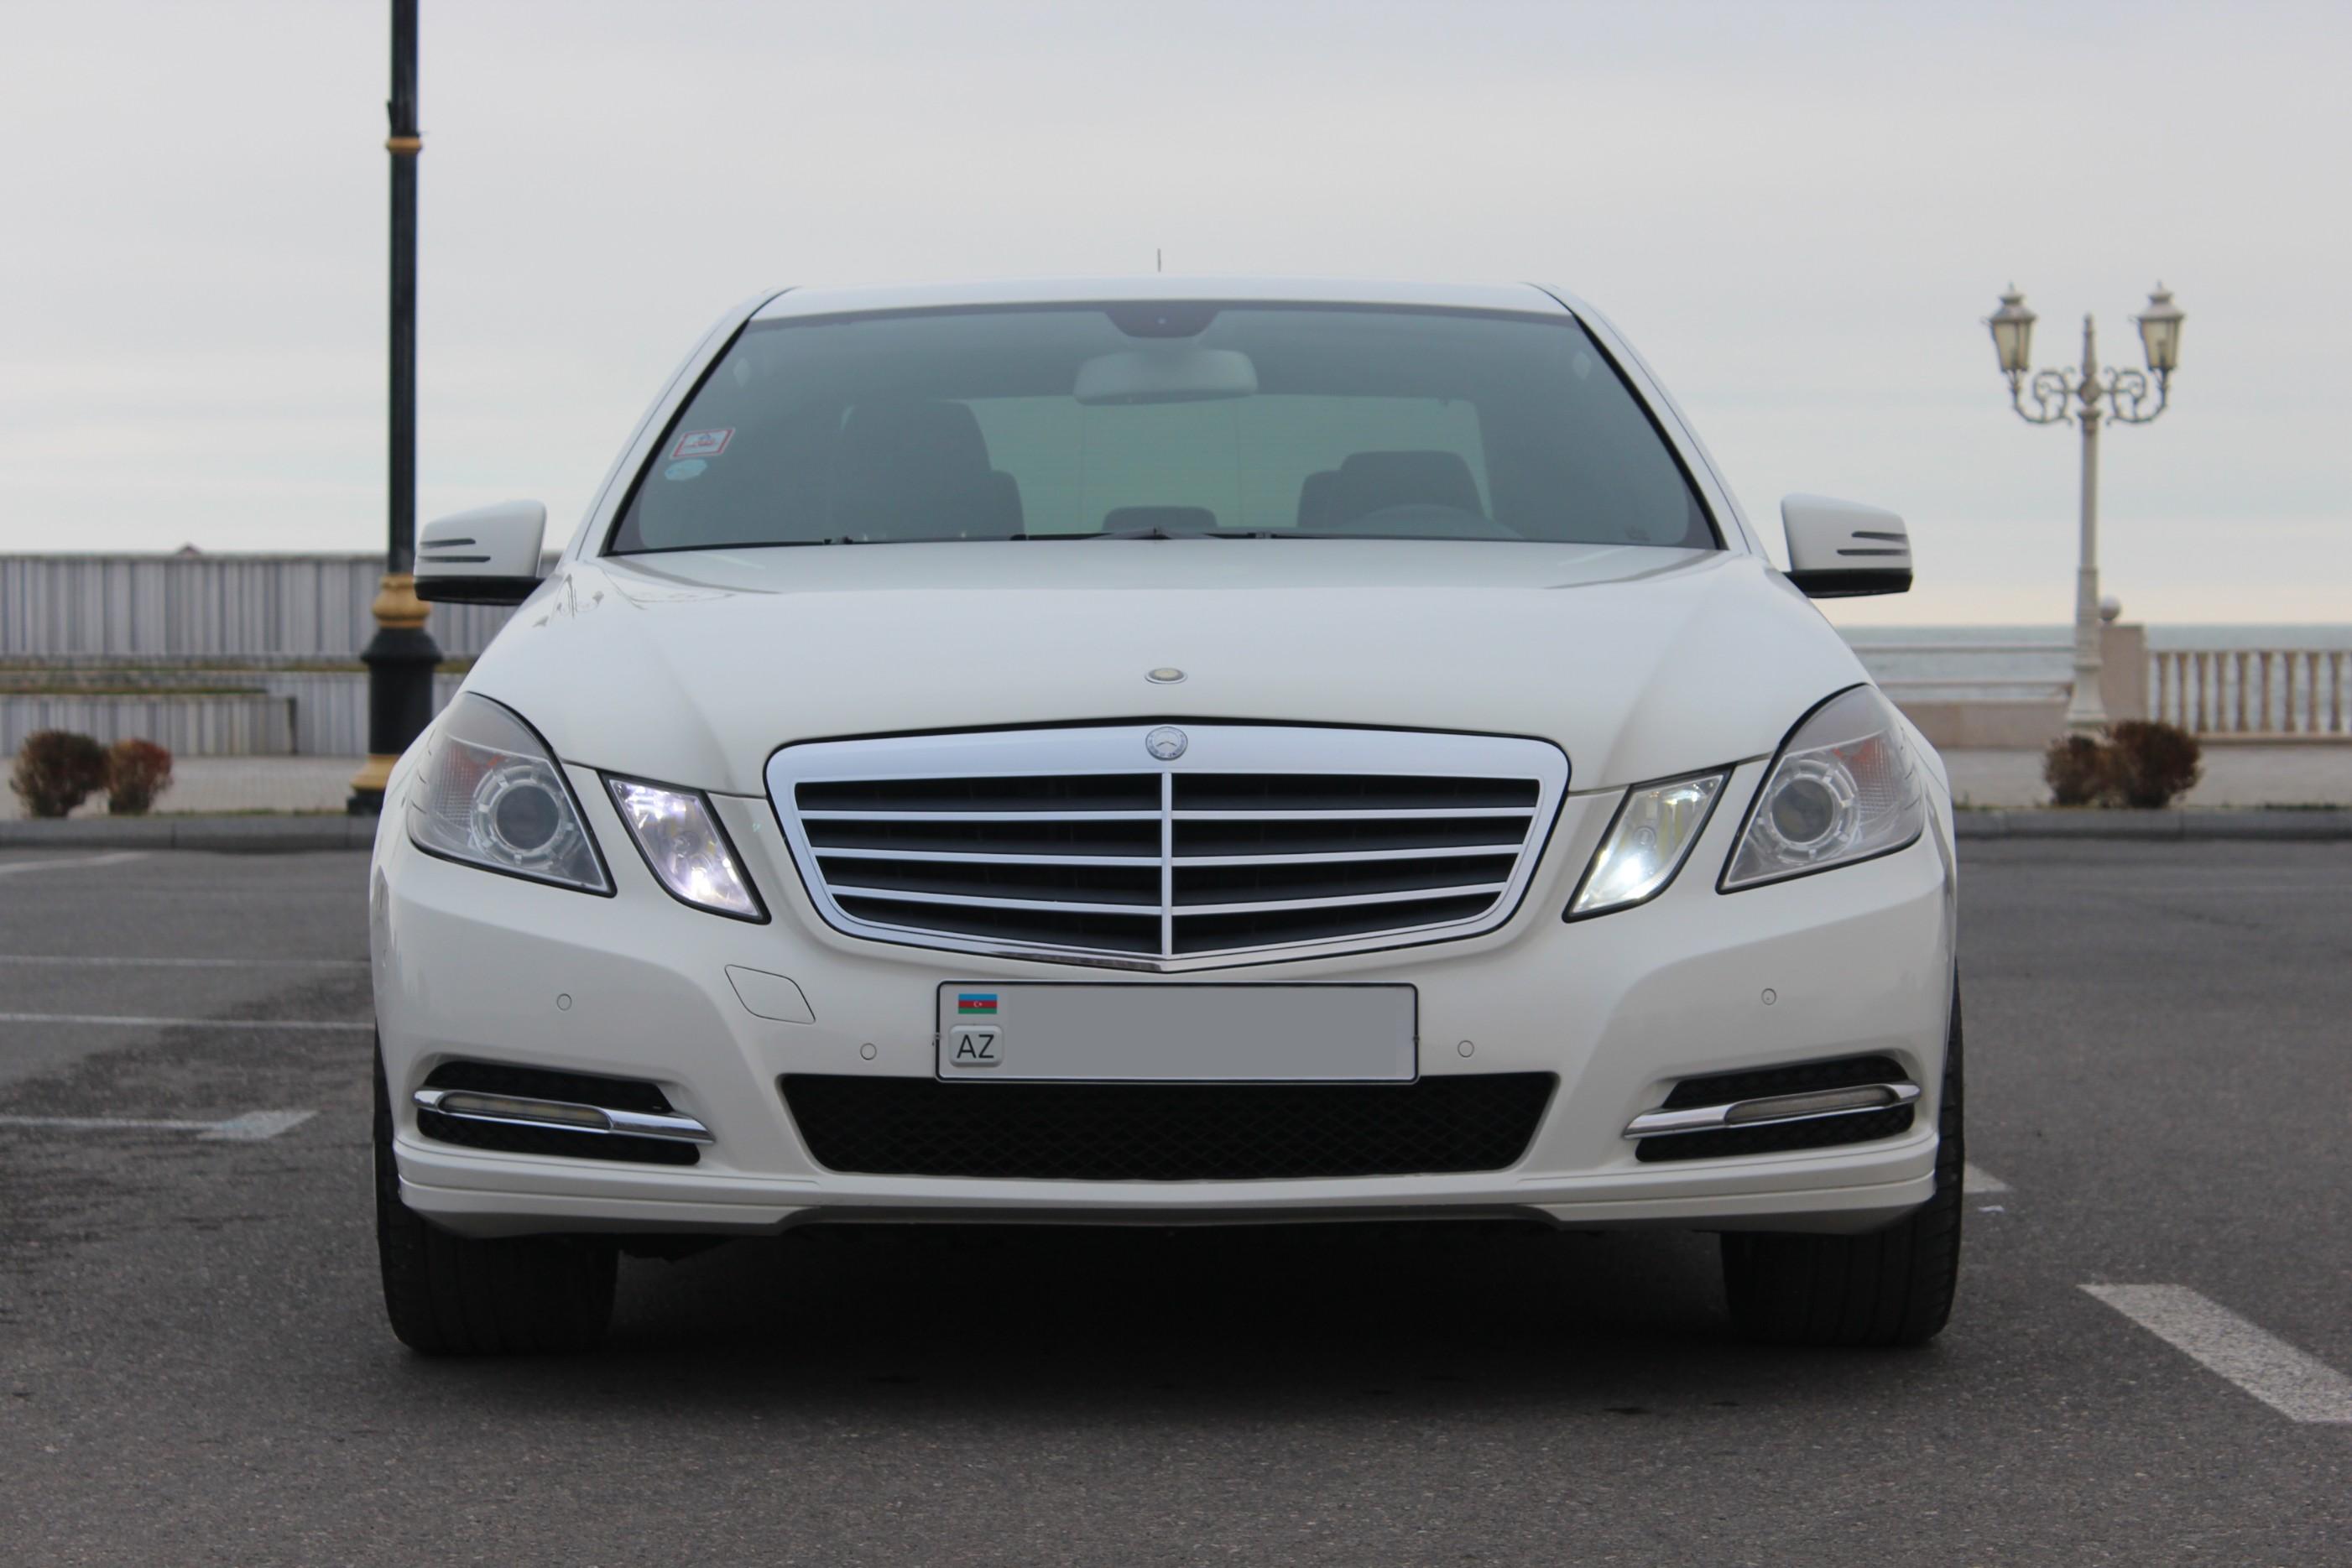 Mercedes-Benz E 220 2.2(lt) 2009 Подержанный  $18000